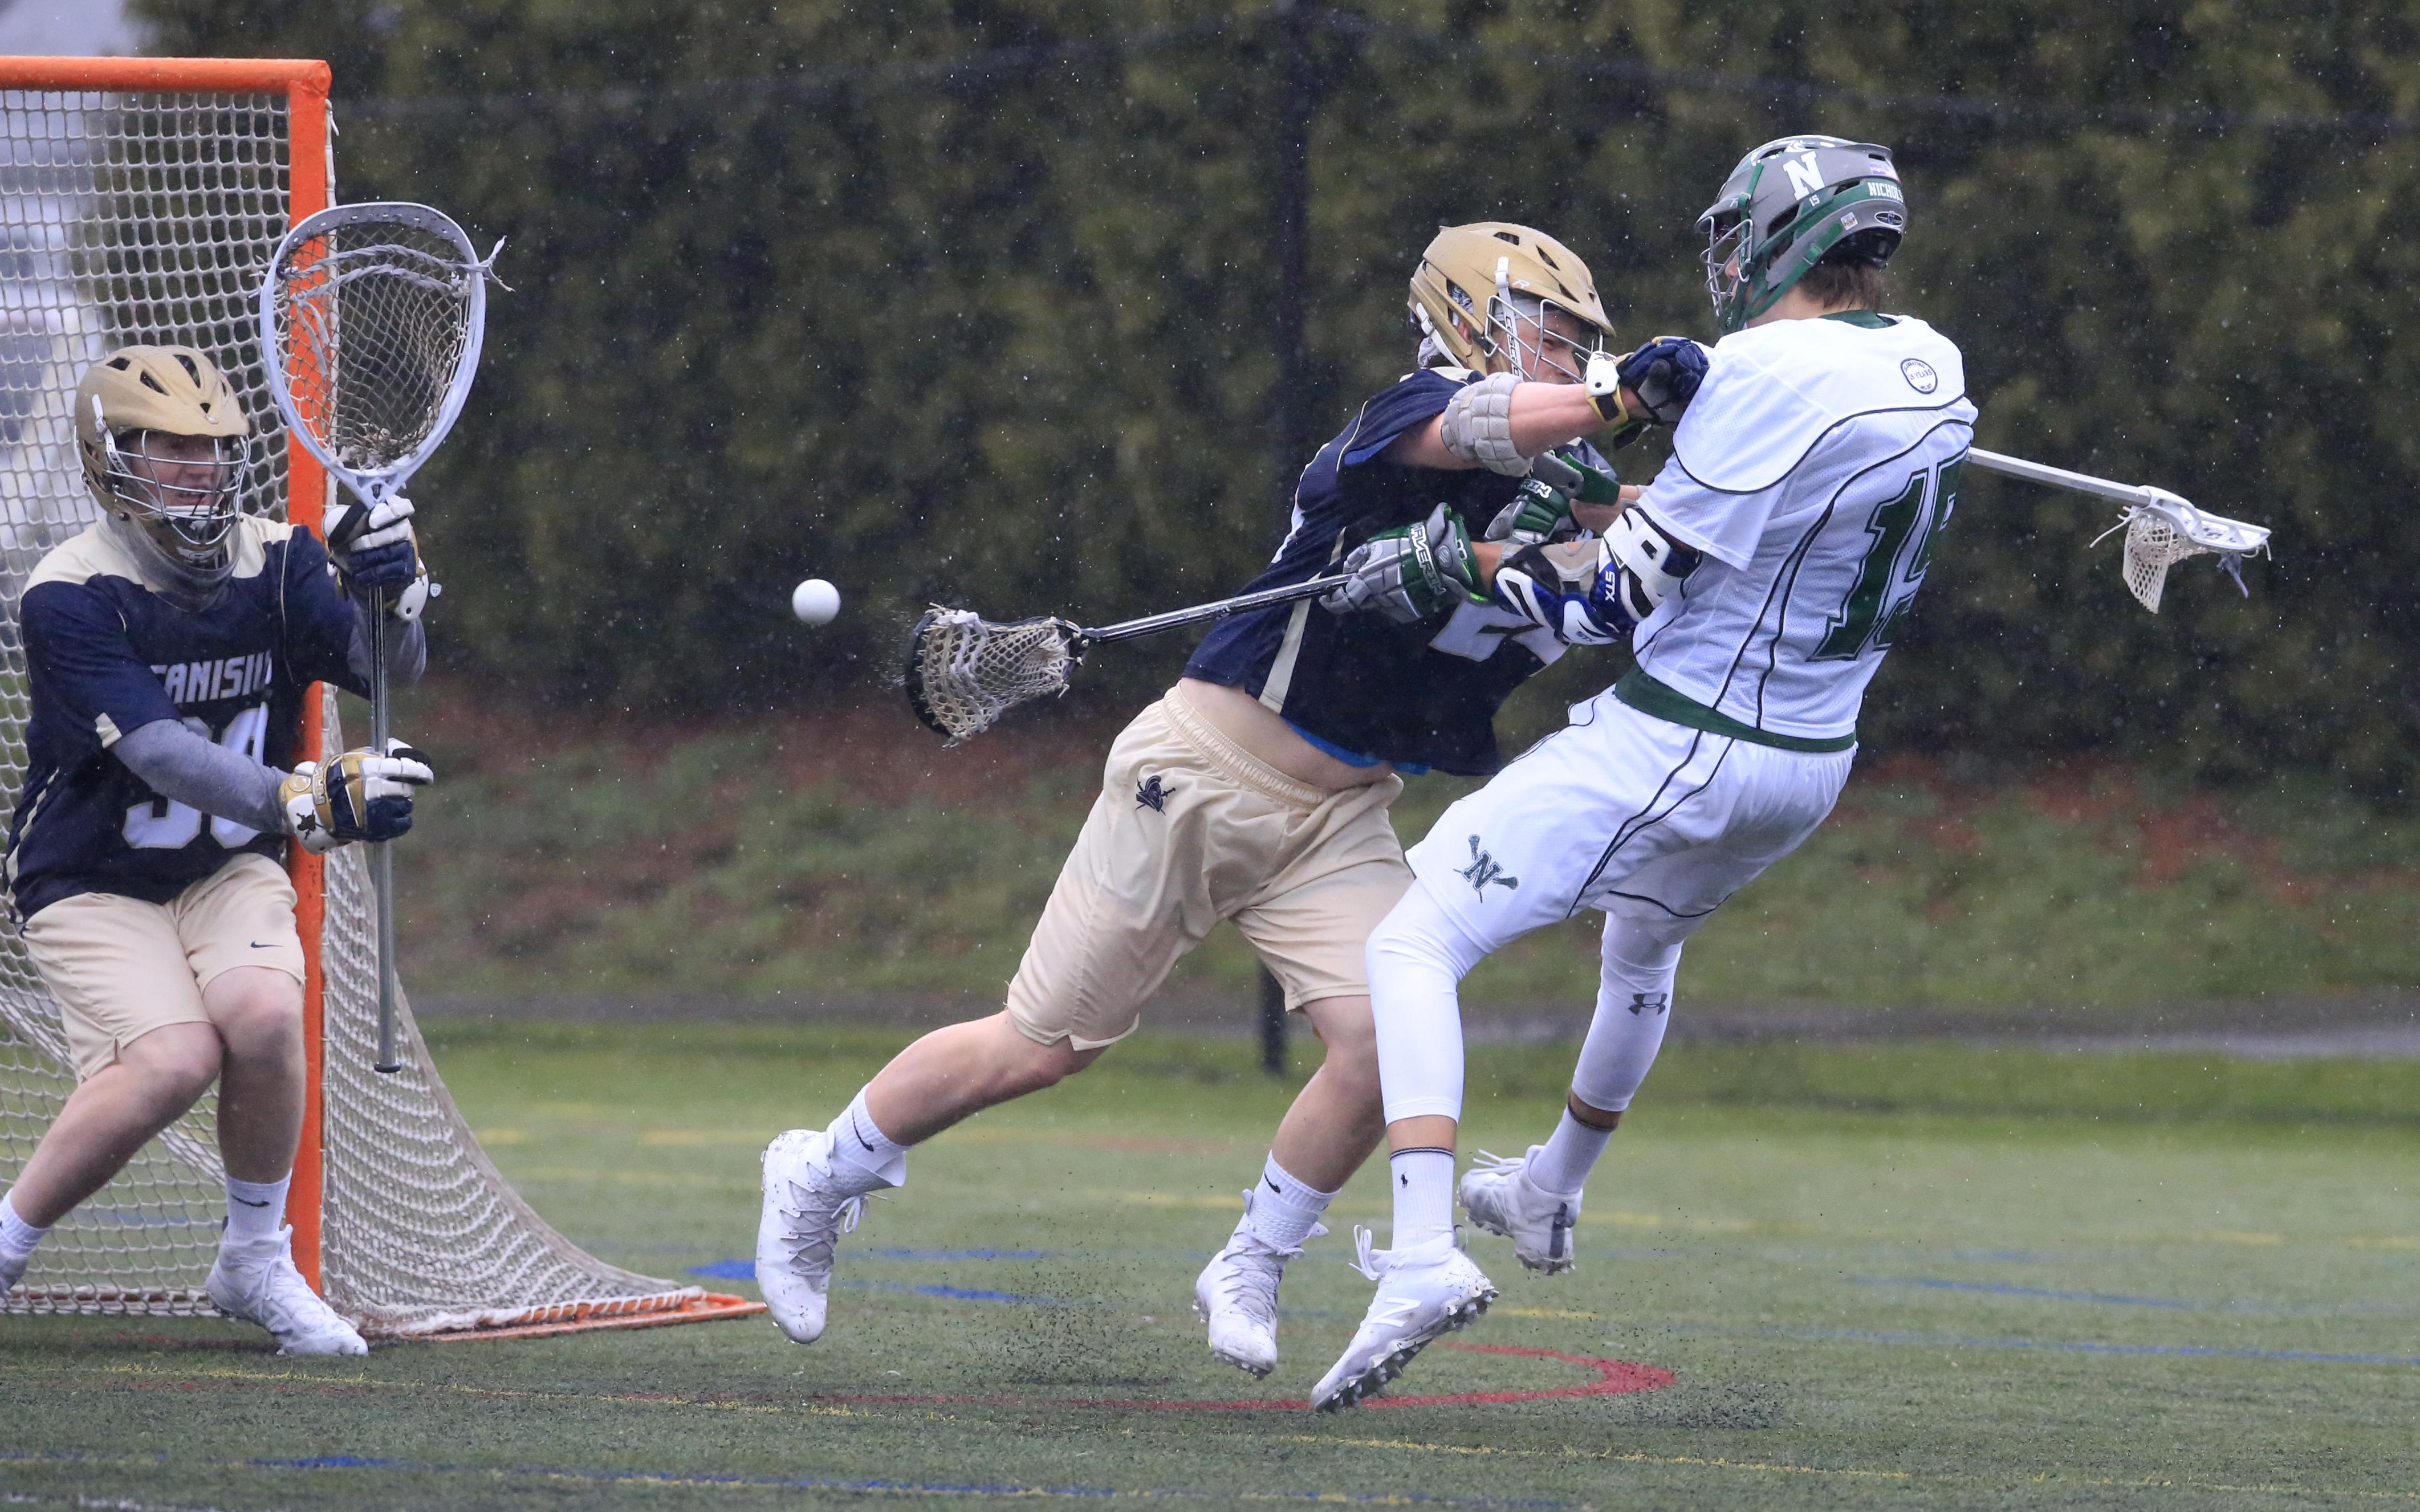 Canisius' Peter Zittel takes out Nichols' Matt Berdysiak during Thursday's boys lacrosse game at Nichols. (Harry Scull Jr./Buffalo News)